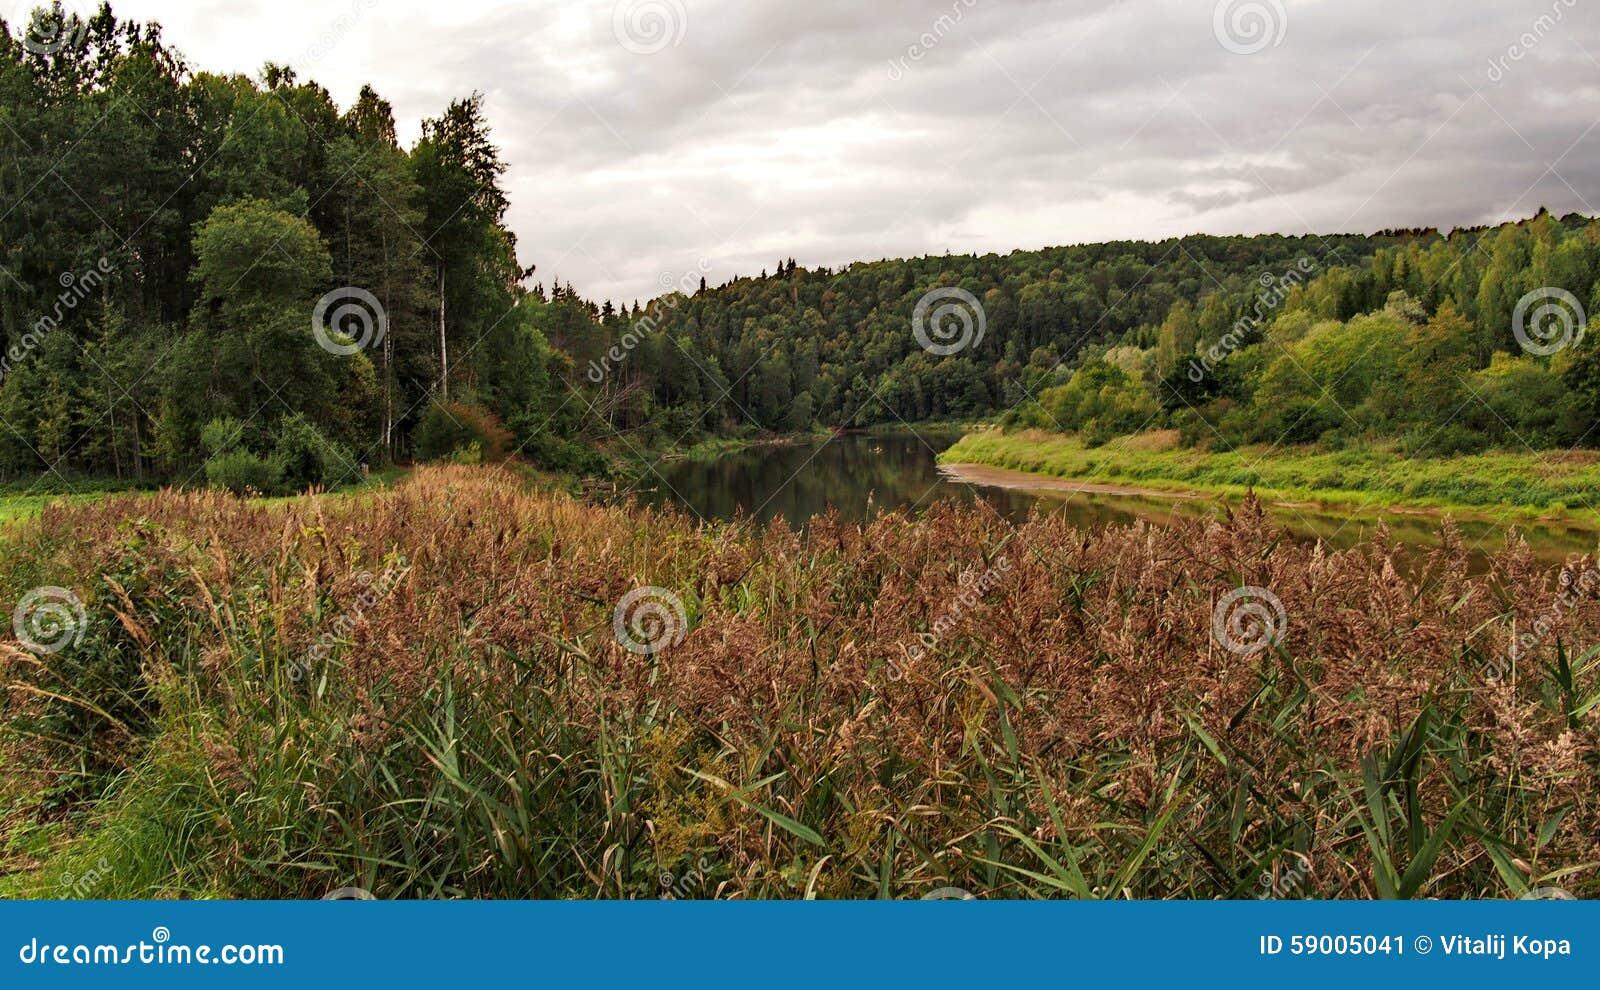 latvian autumn forest river - photo #4